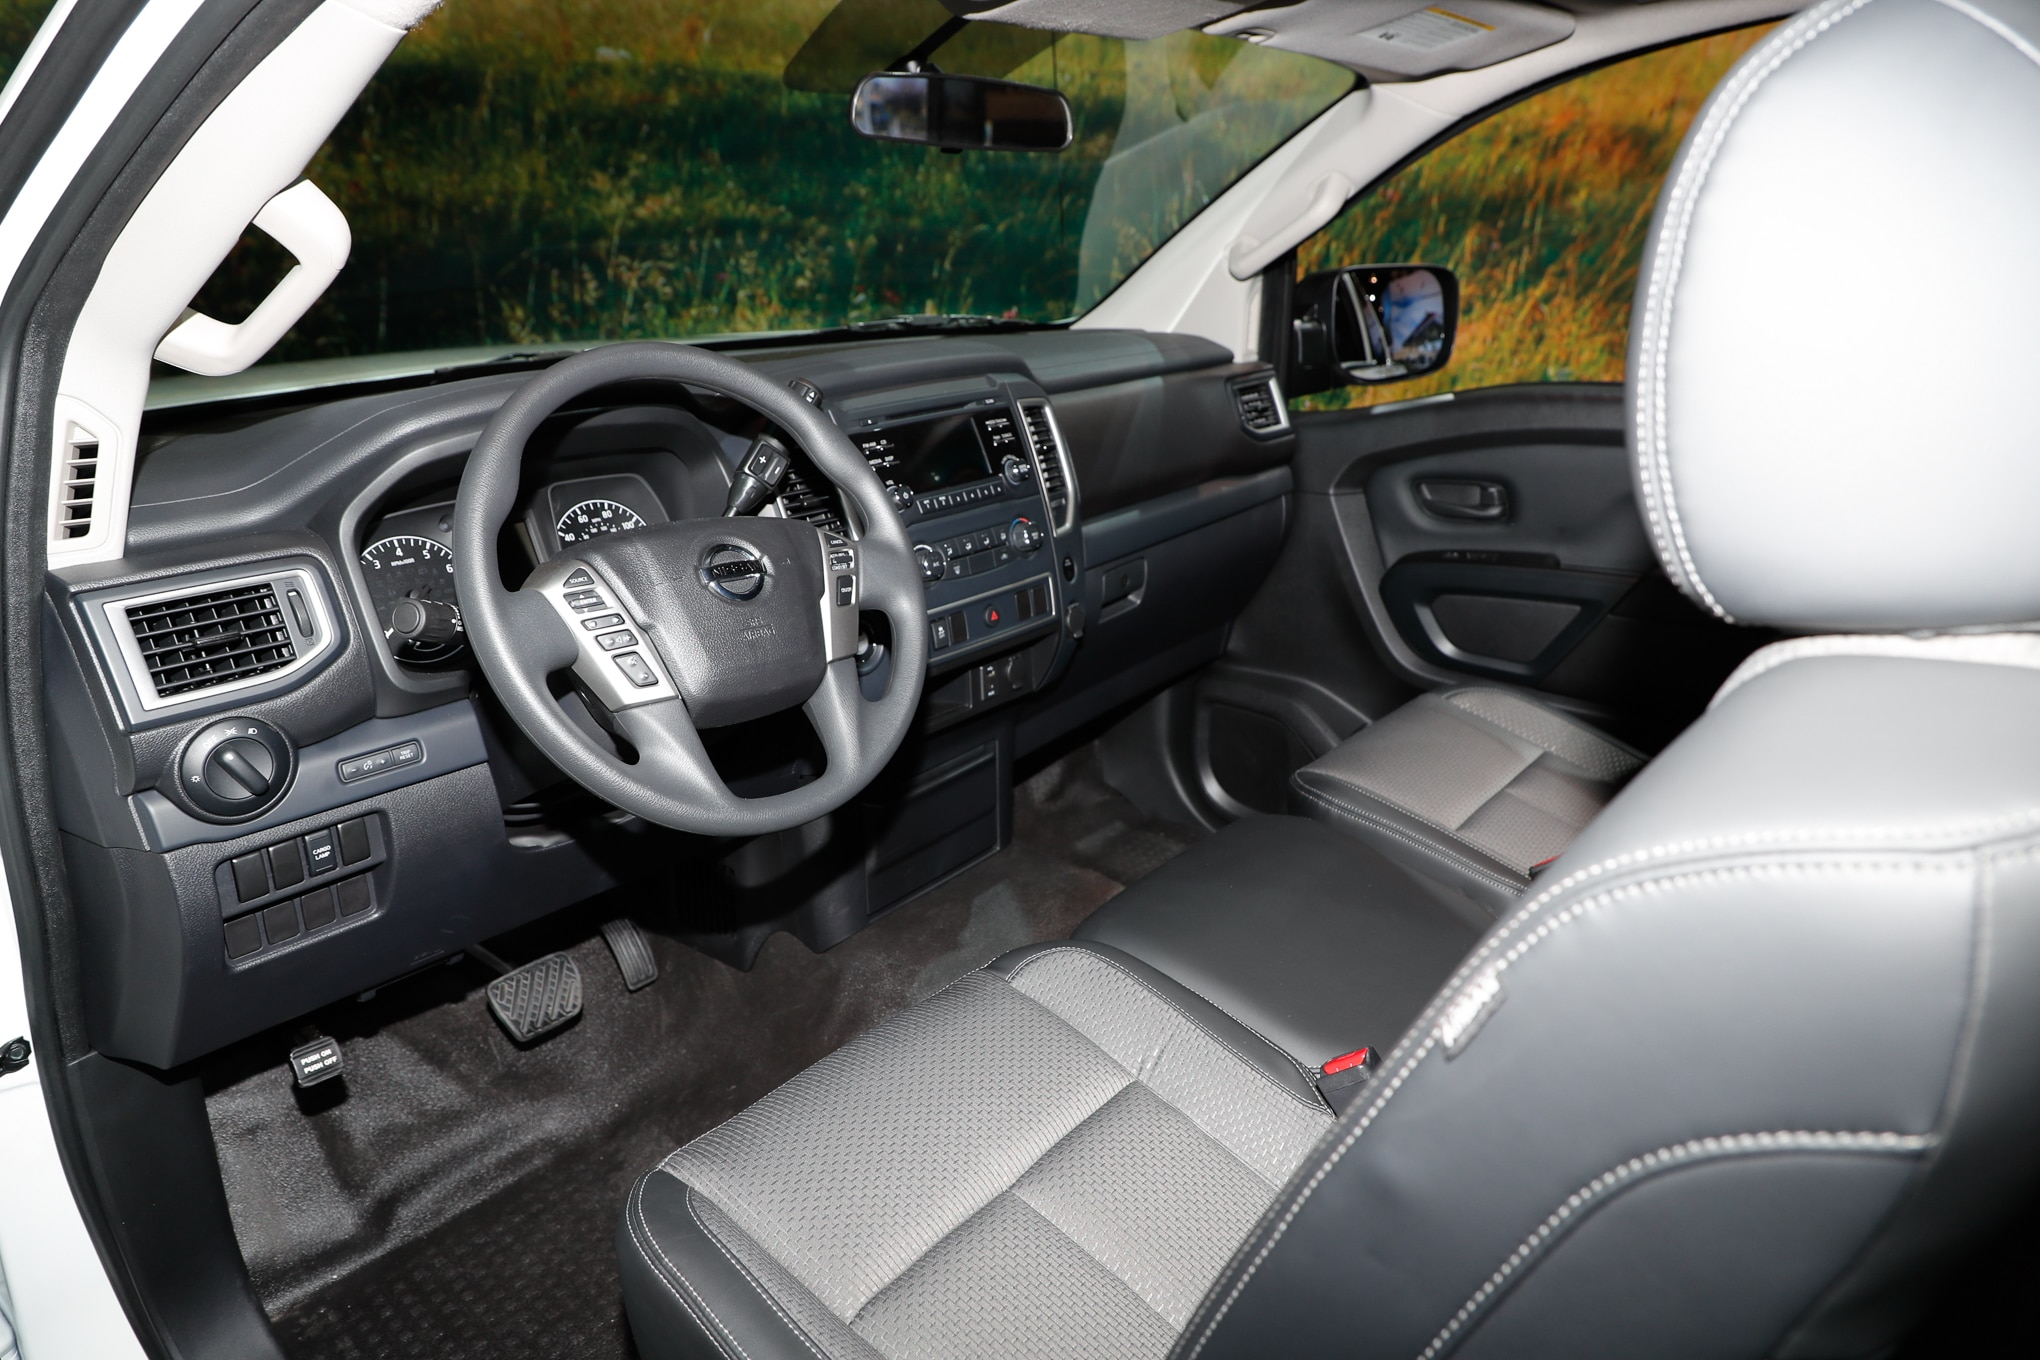 2017 Nissan Titan King Cab Starts at $33,475 | Automobile ...